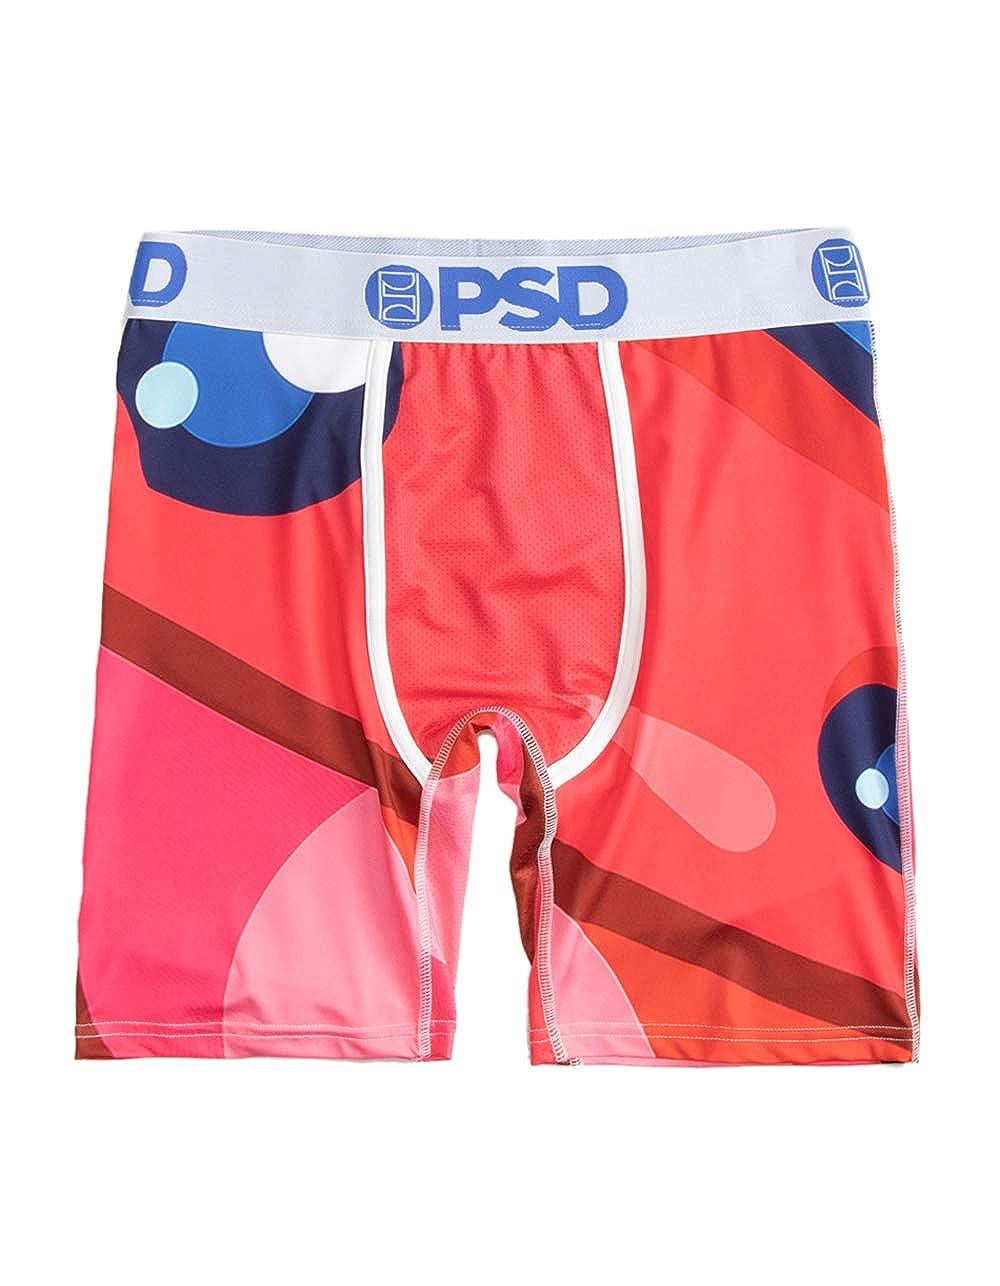 PSD Underwear Mens Ninja Pon